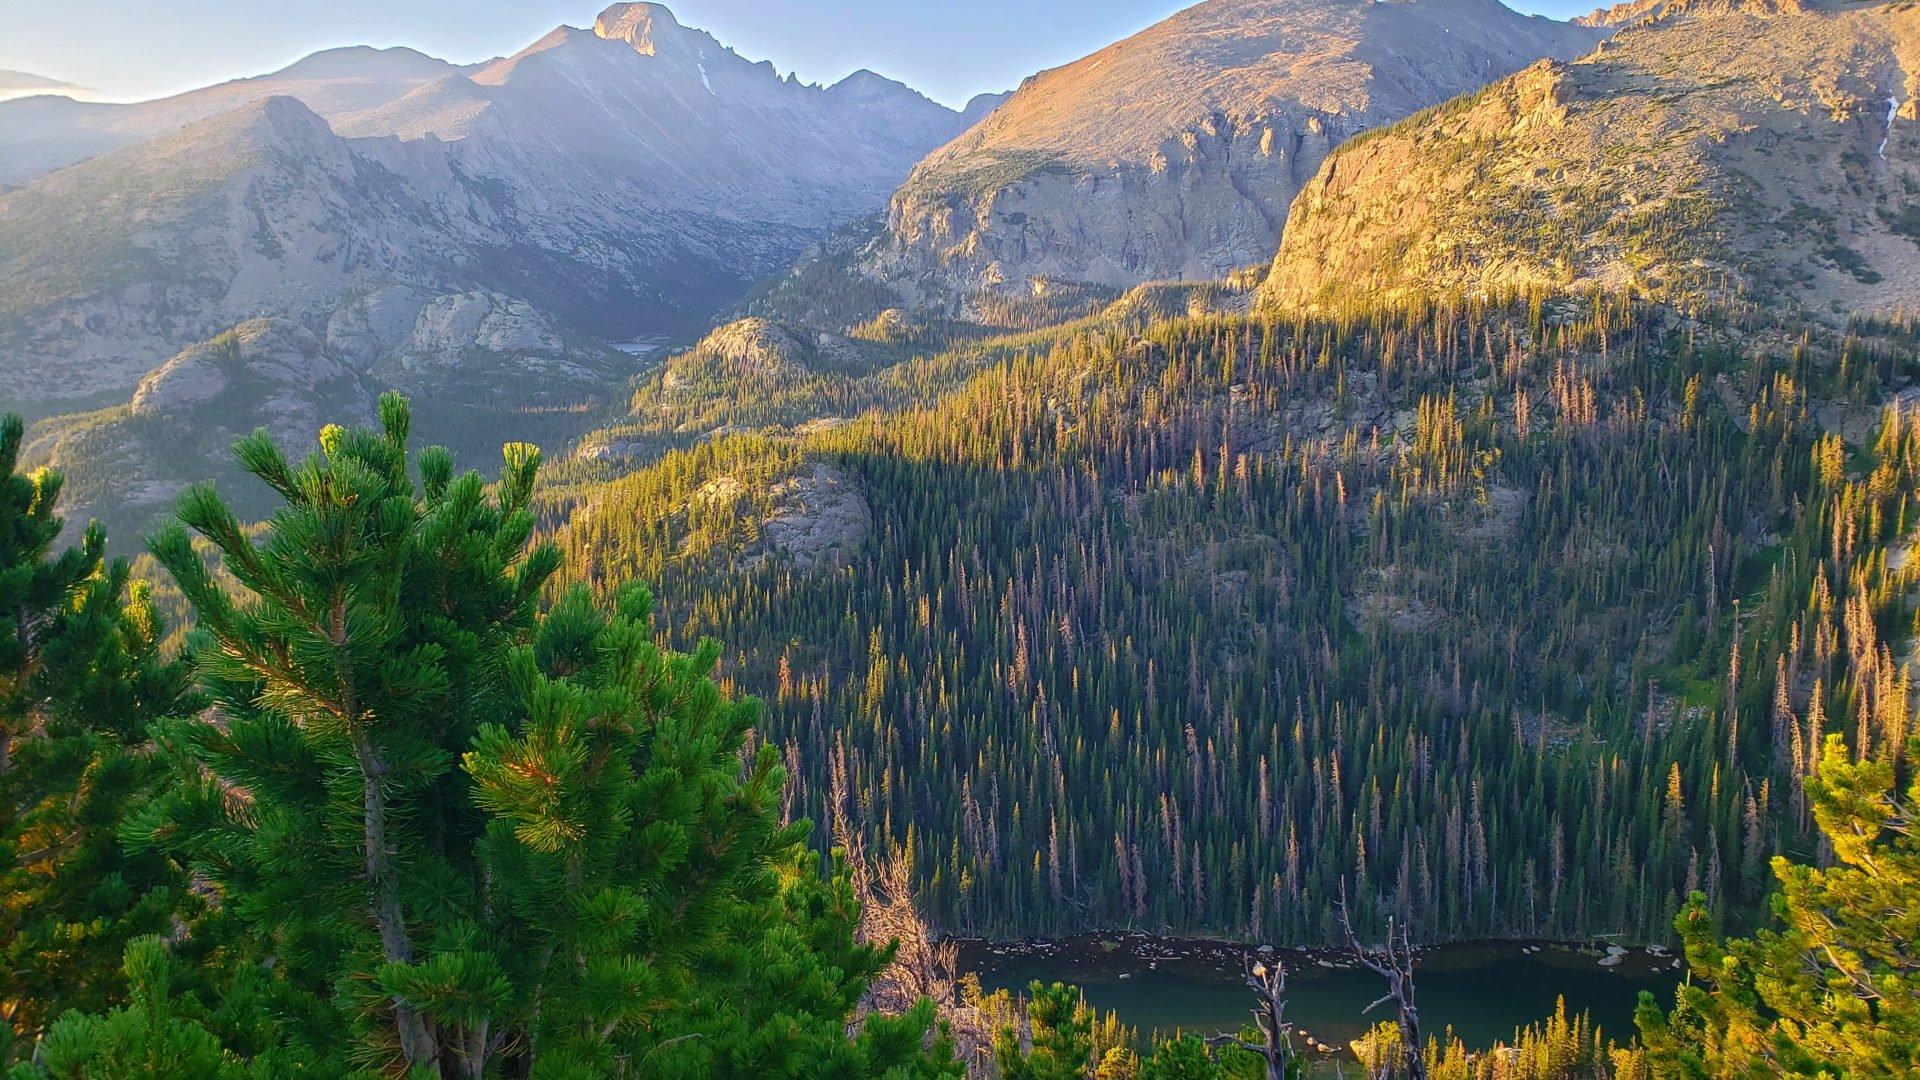 Permalink to: Hallett Peak 12,713′